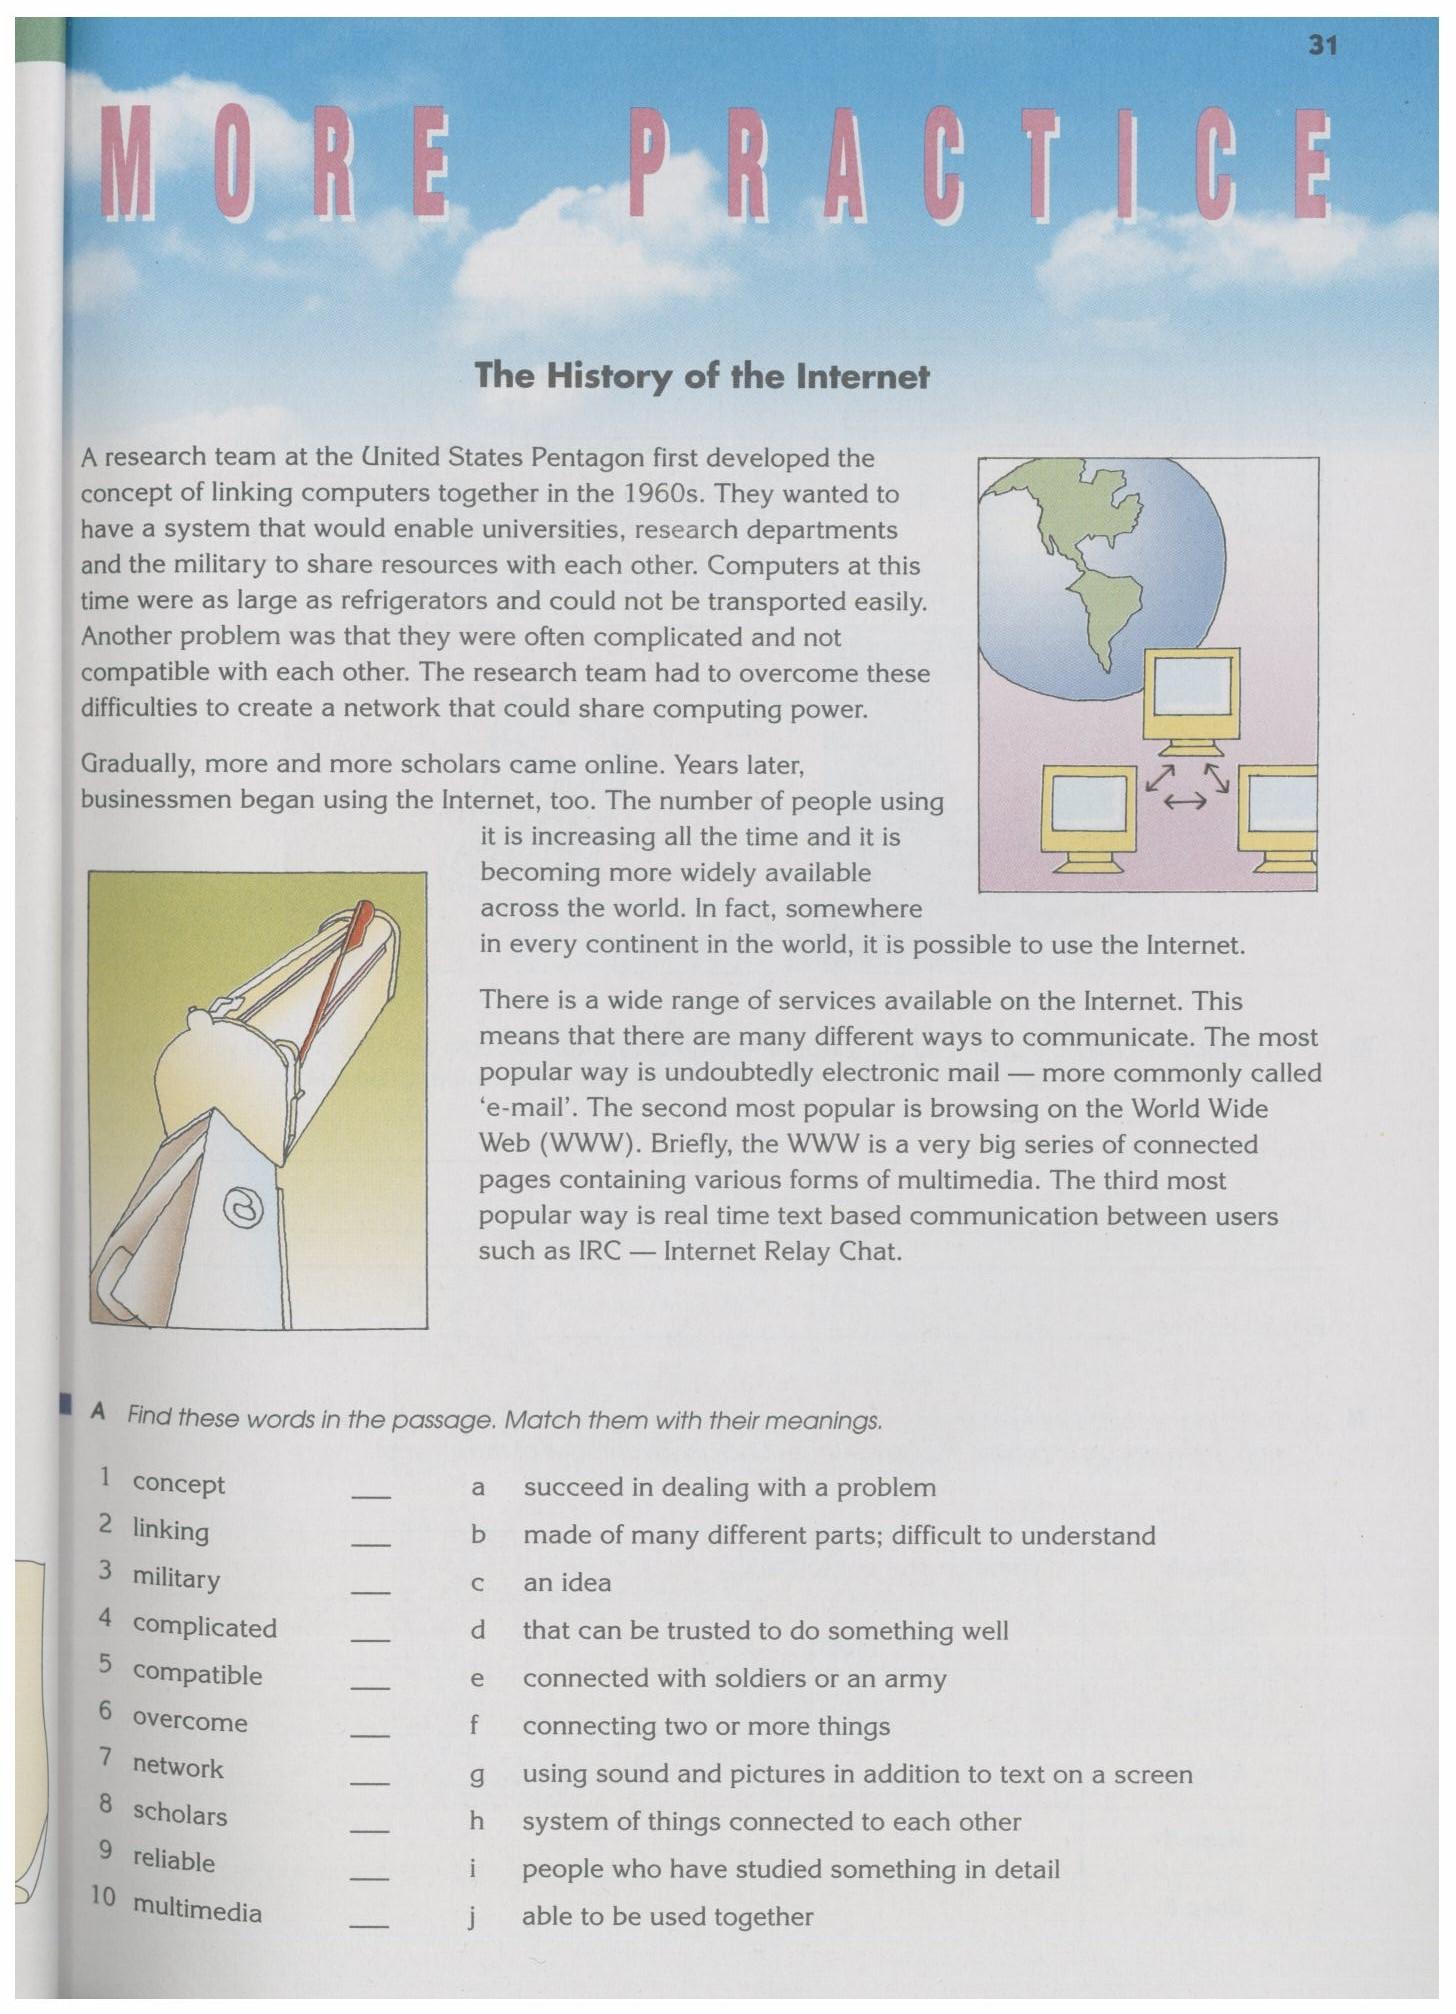 沈阳版牛津英语9A教材Chapter2-More Practice